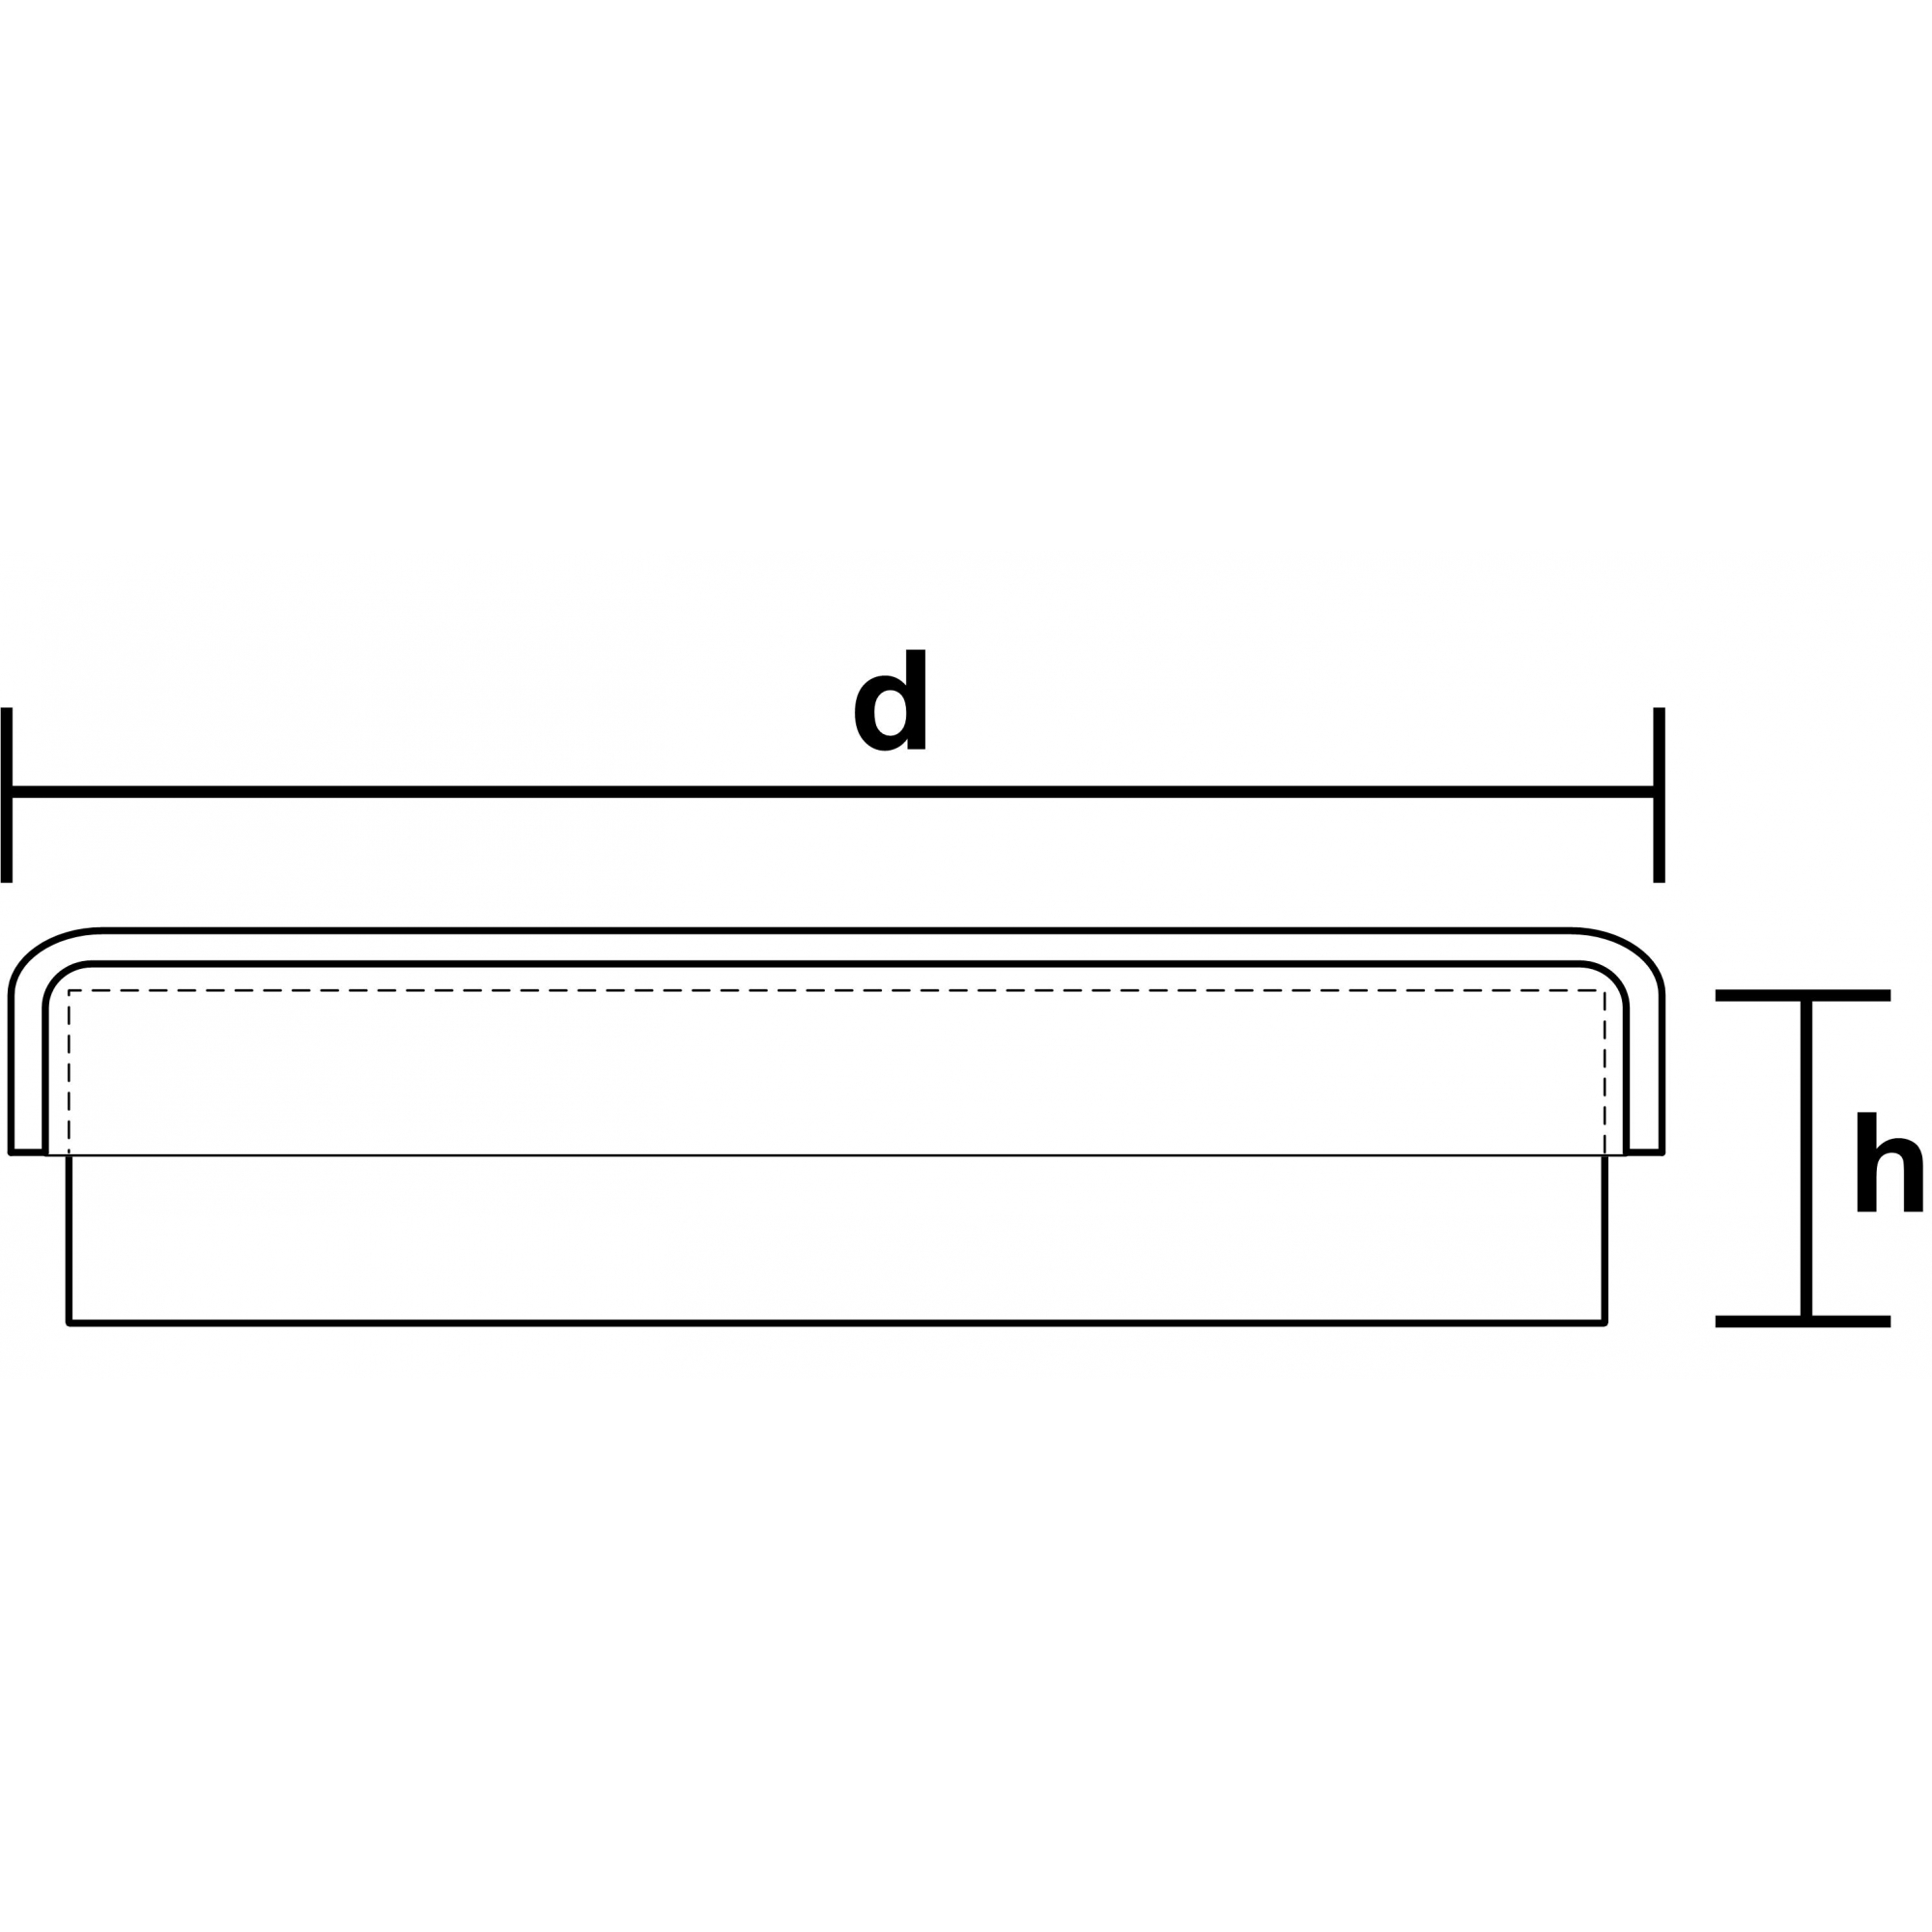 PLACA DE PETRI 60 X 15 MM - Laborglas - Cód. 9375540